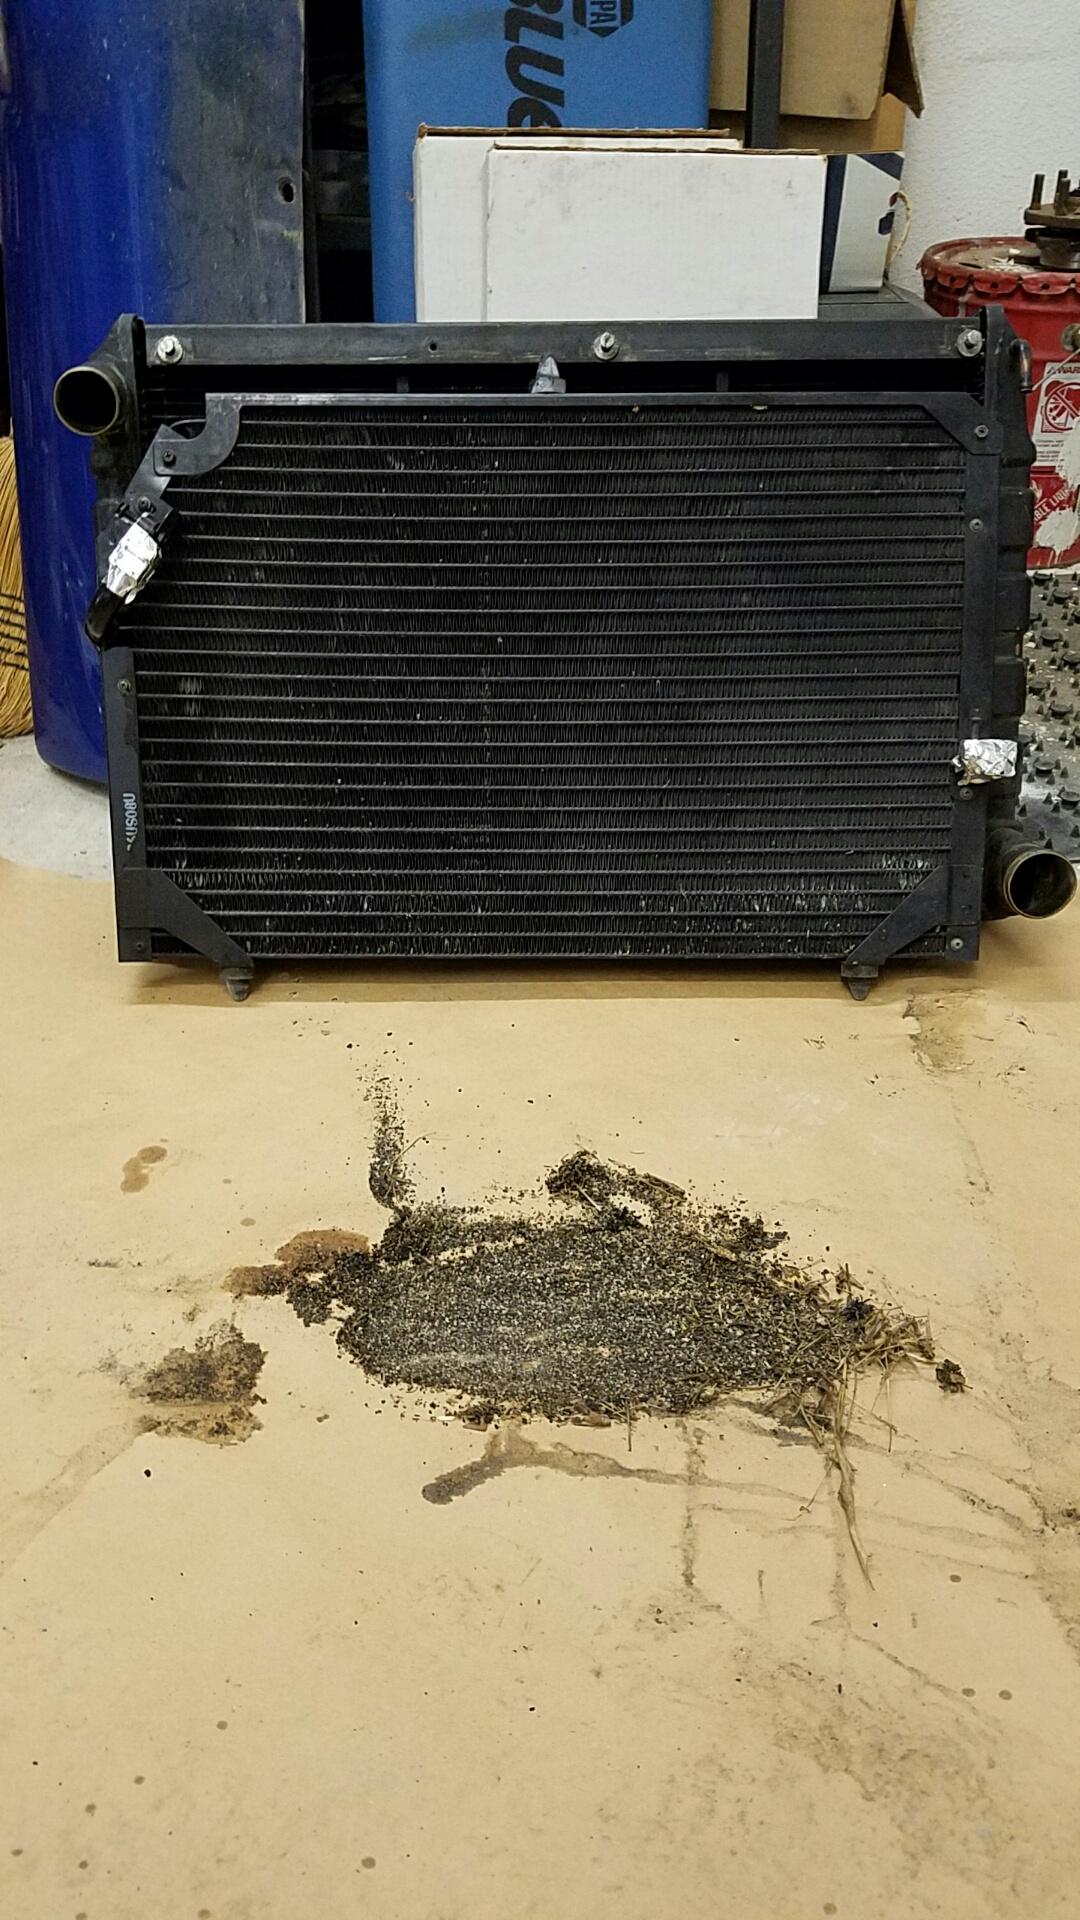 Click image for larger version  Name:radiator trash.jpg Views:67 Size:717.9 KB ID:146753